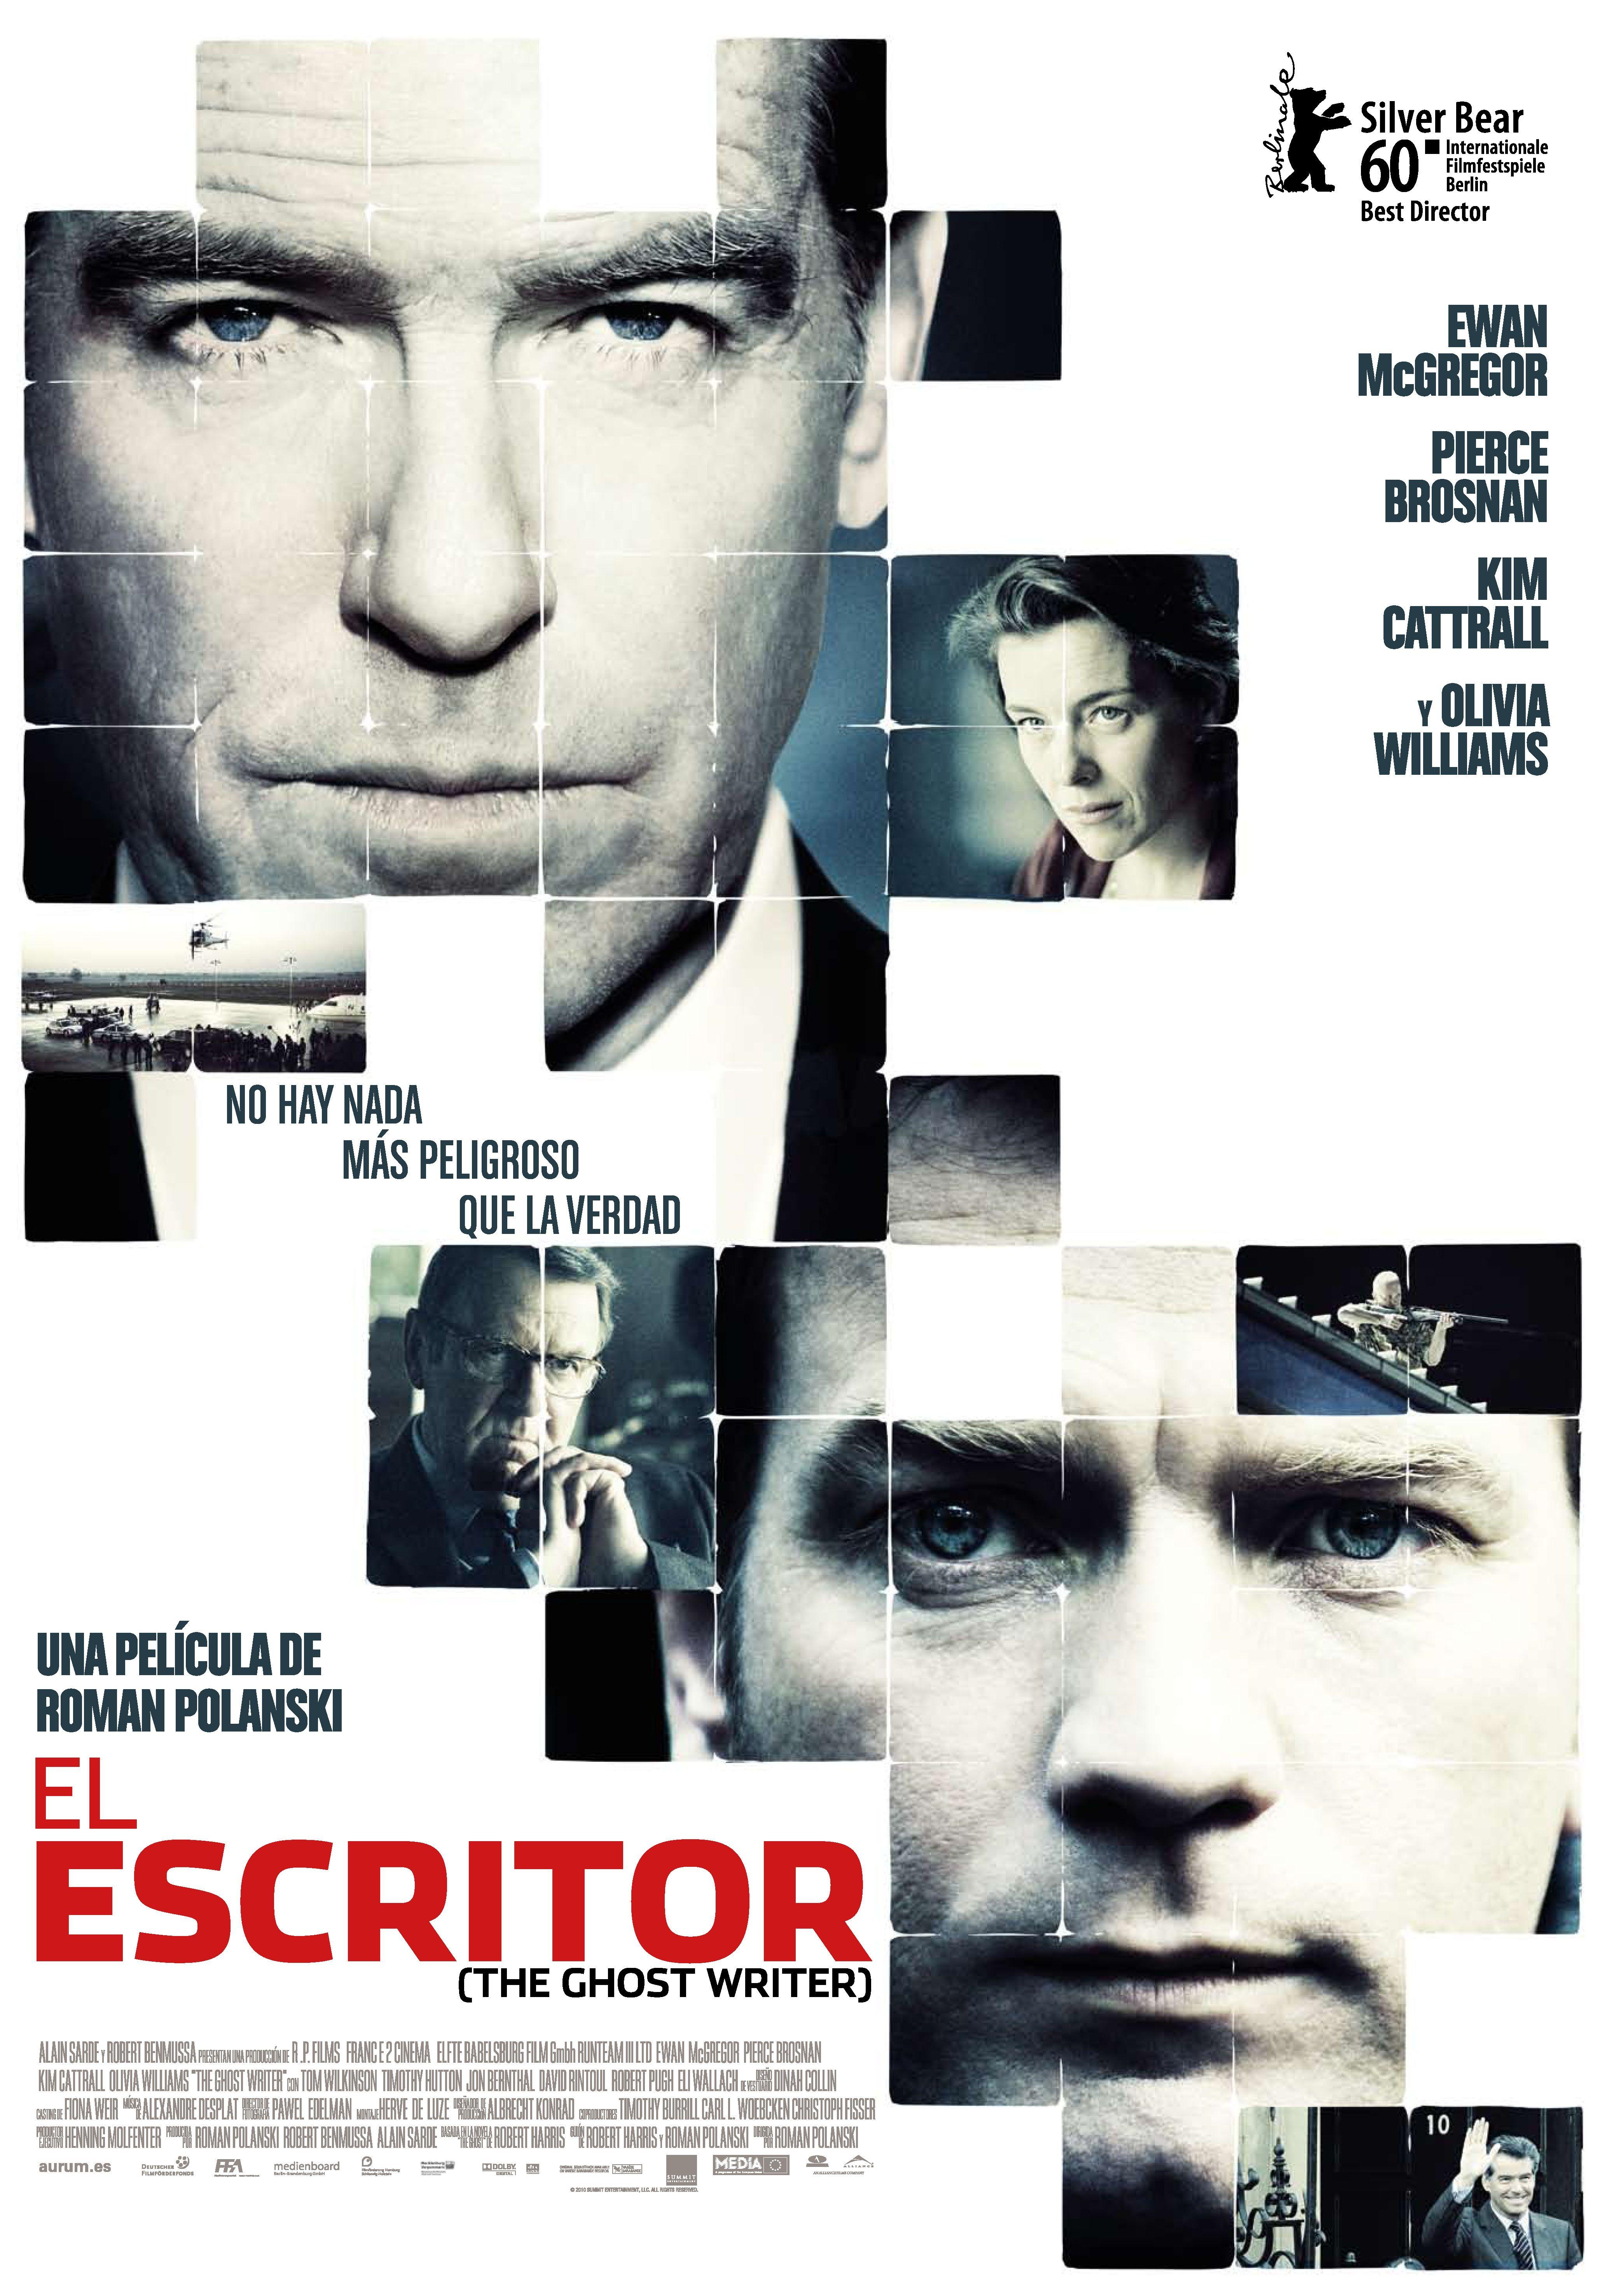 El escritor (The Ghost Writer) - CRITICA de Cine | Pinterest | Movie ...